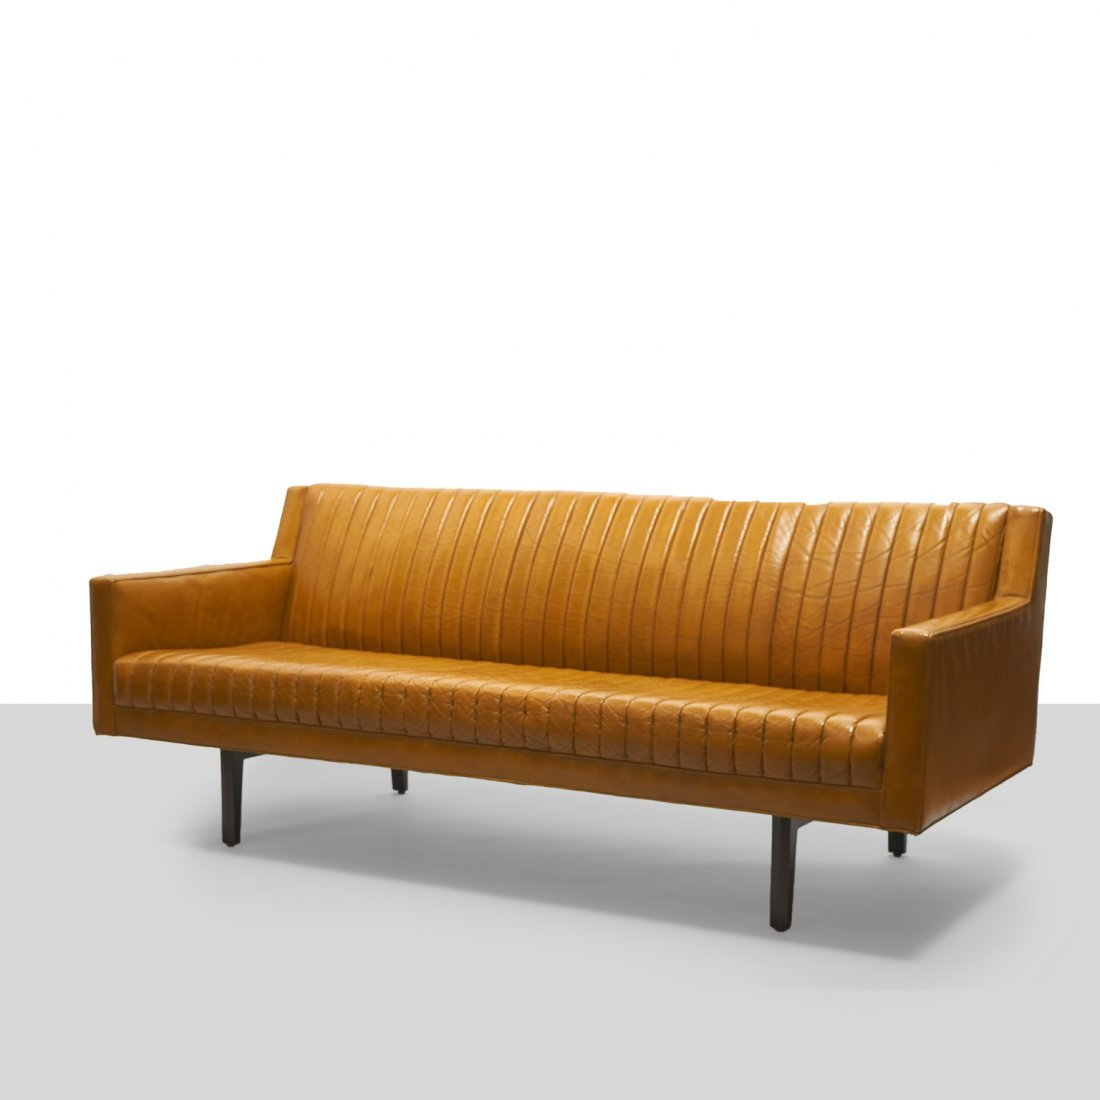 Edward Wormley for Dunbar, Sofa